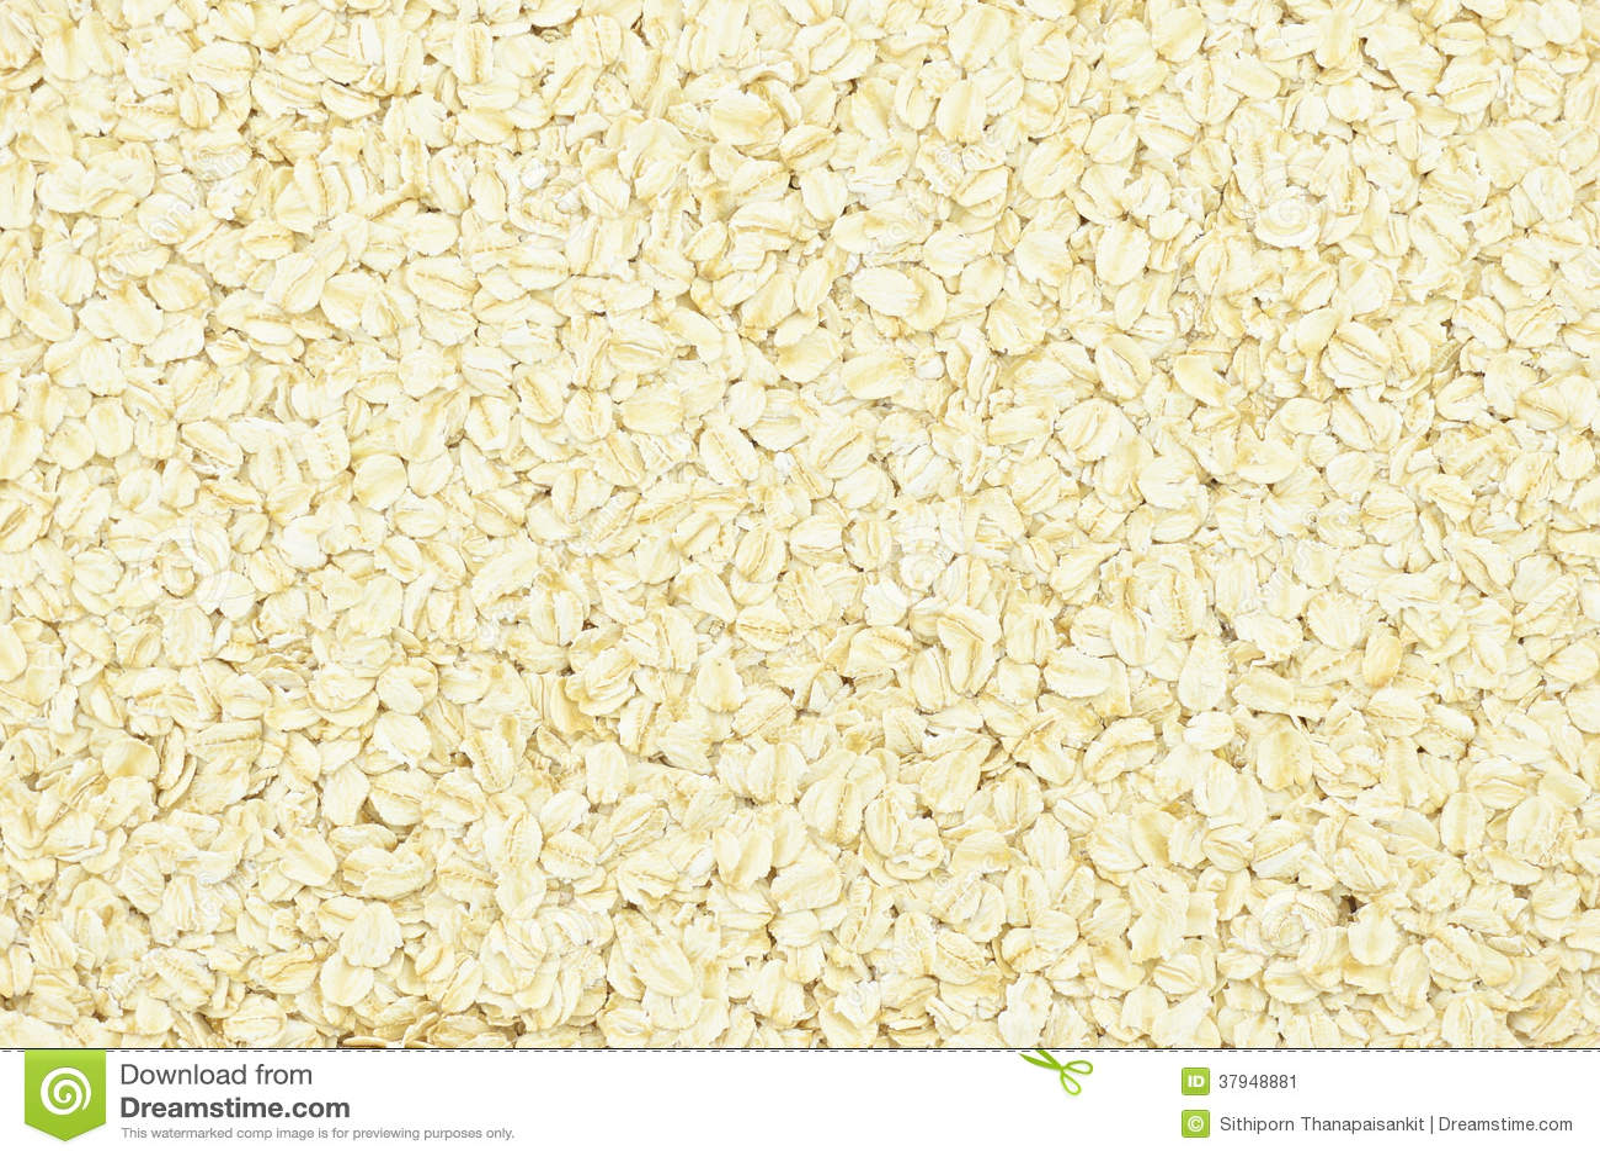 Porridge oats or oatmeal background